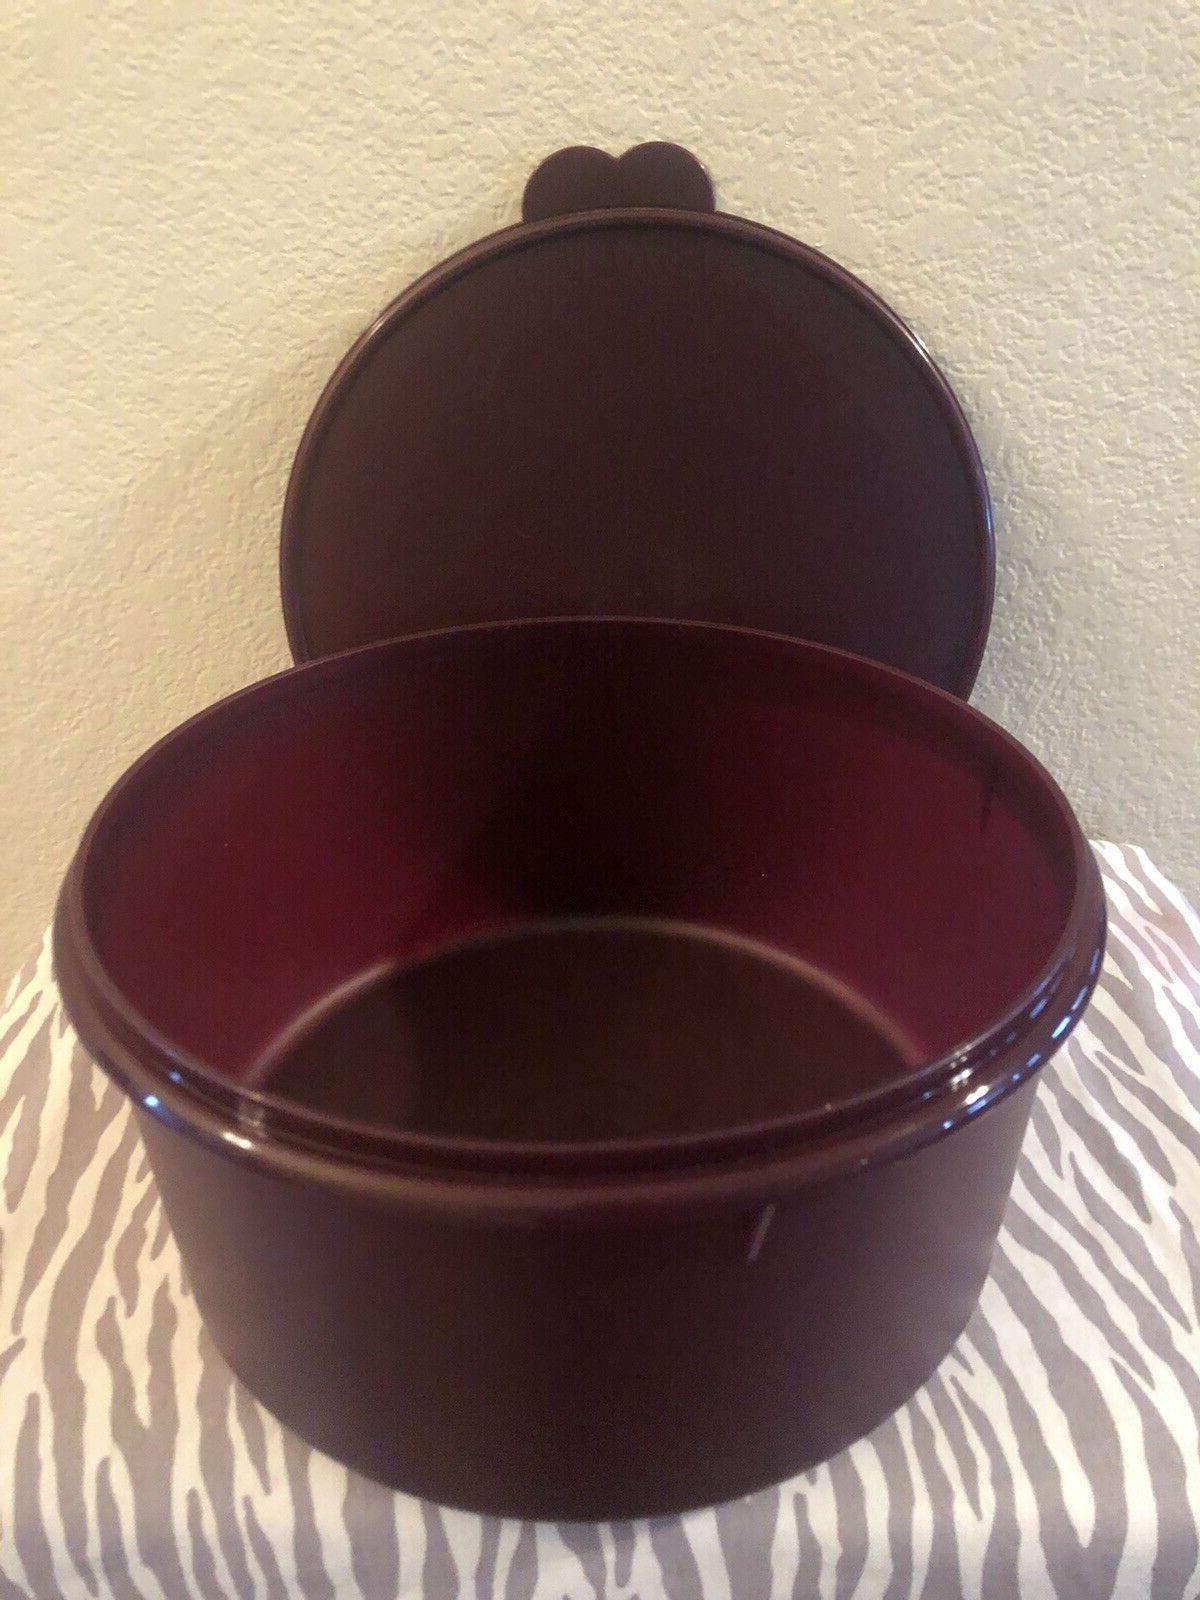 Tupperware Vintage / Storage 42 Plum